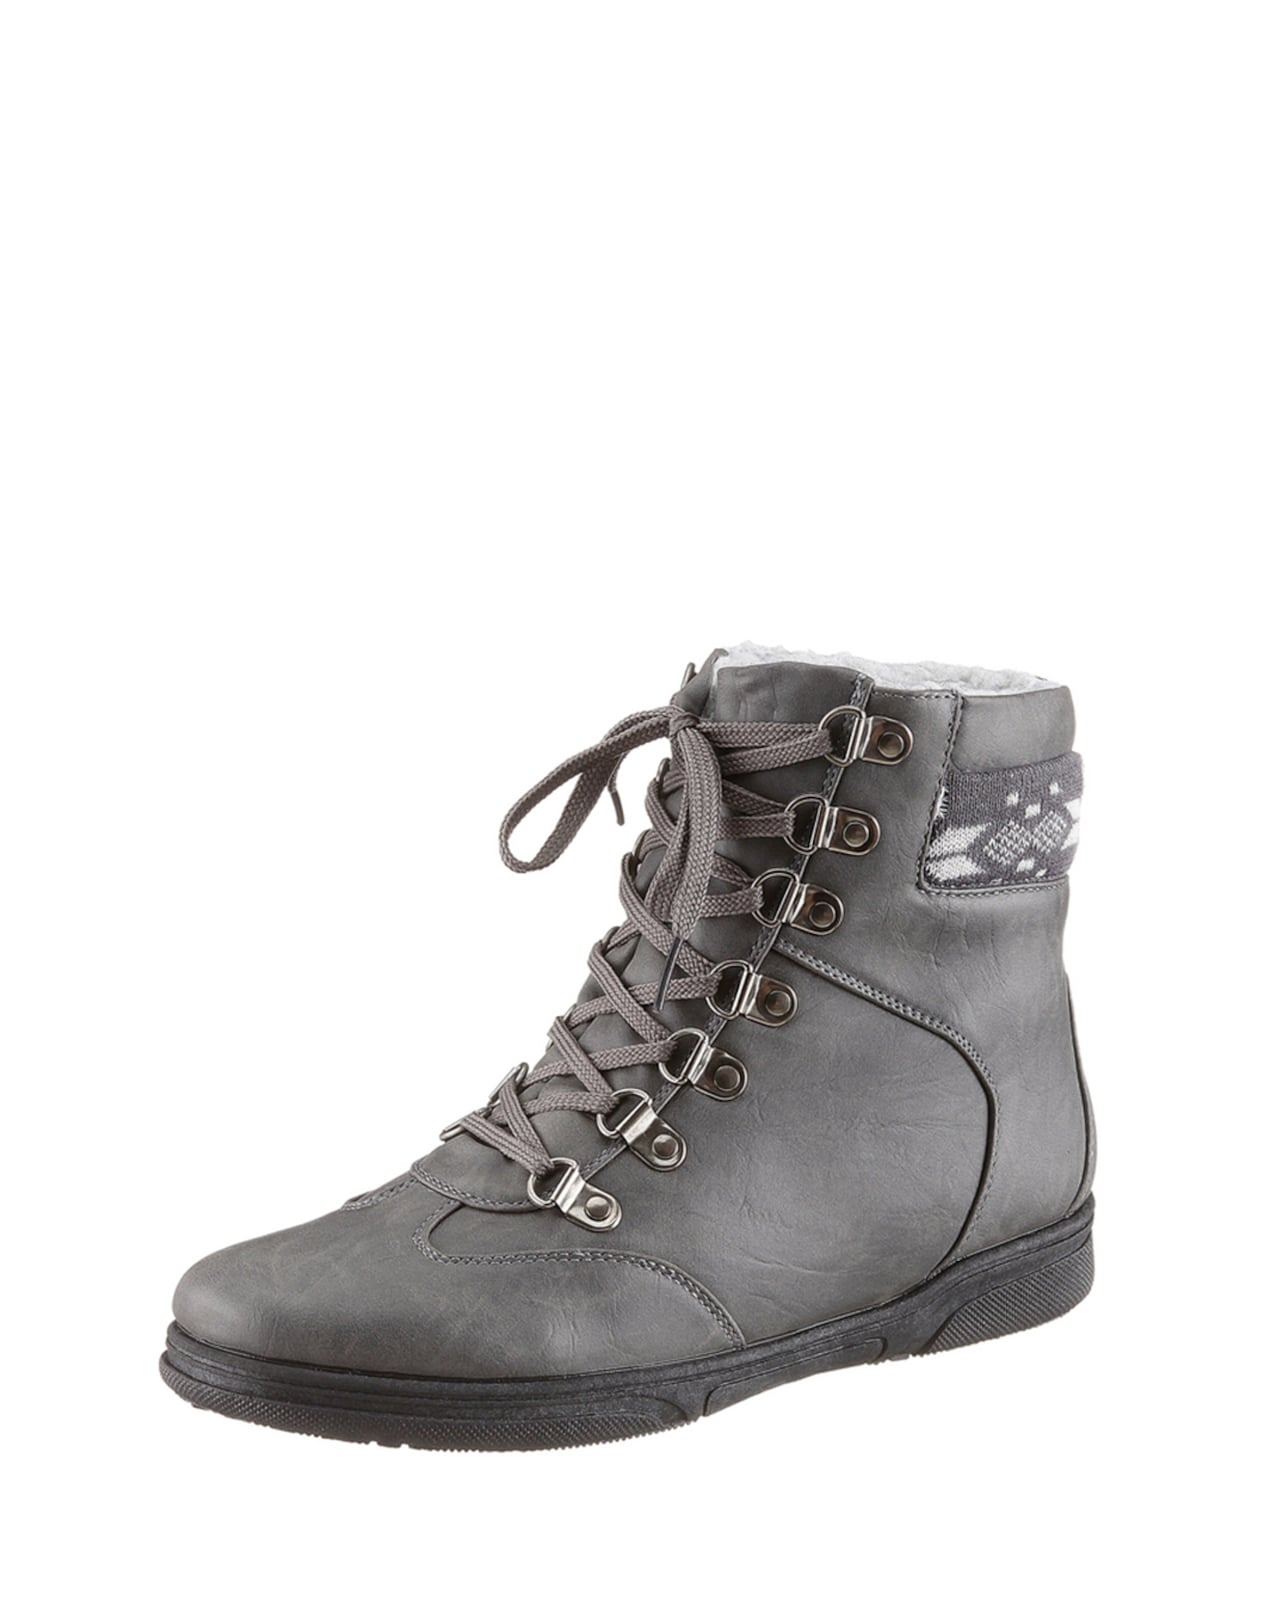 CITY WALK Boots